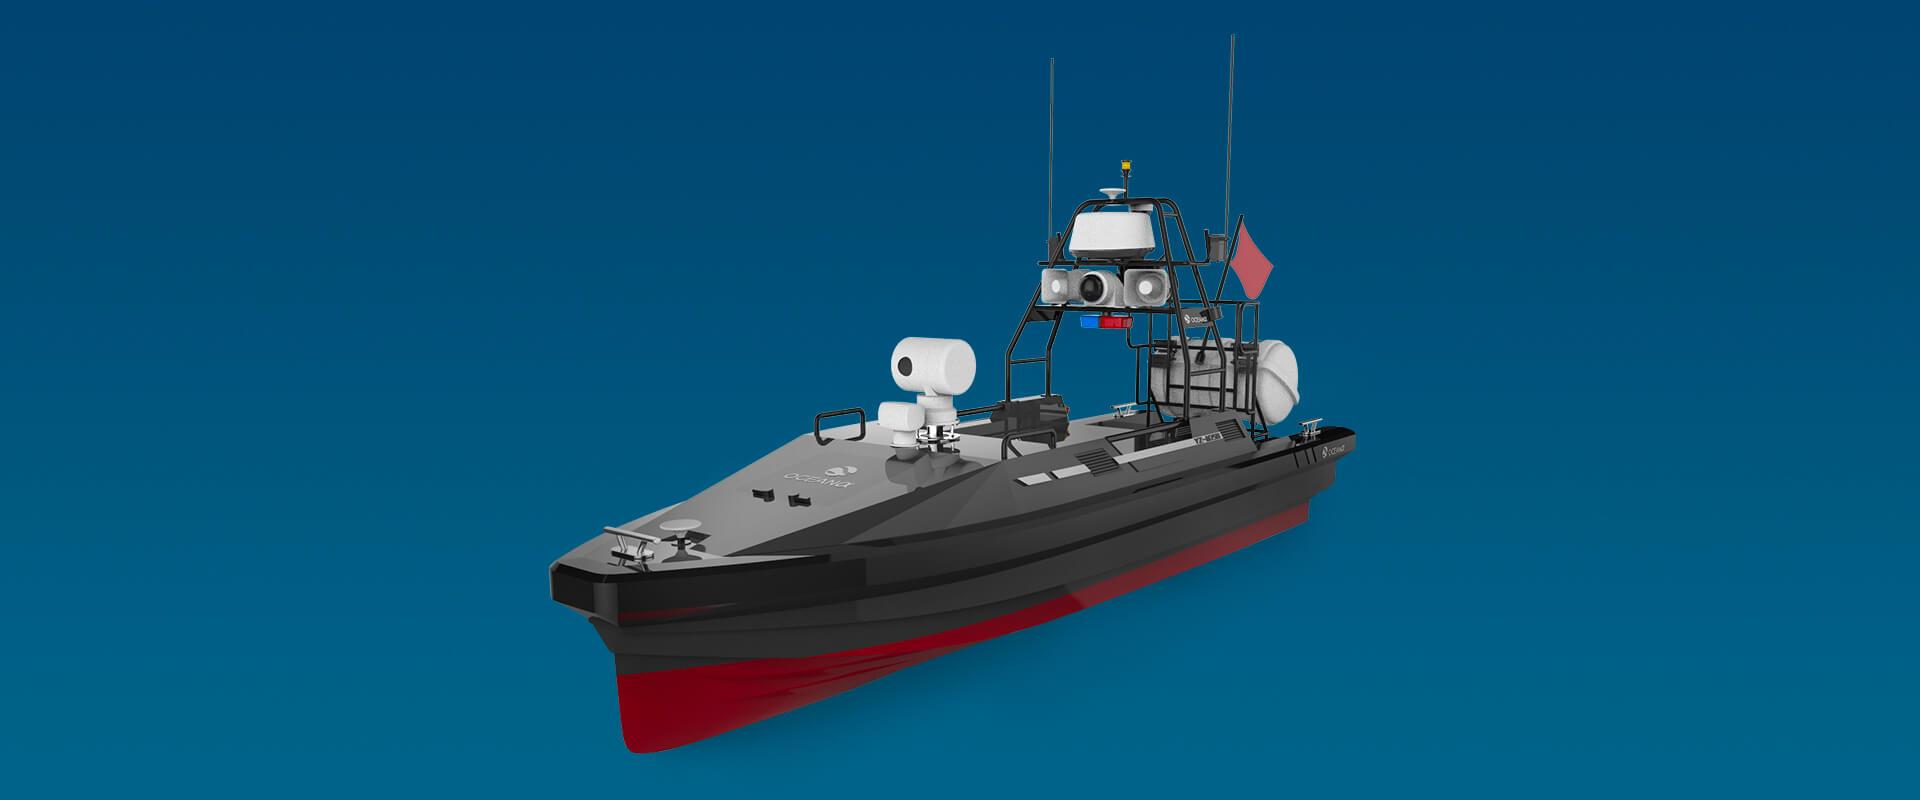 m75 380 profile